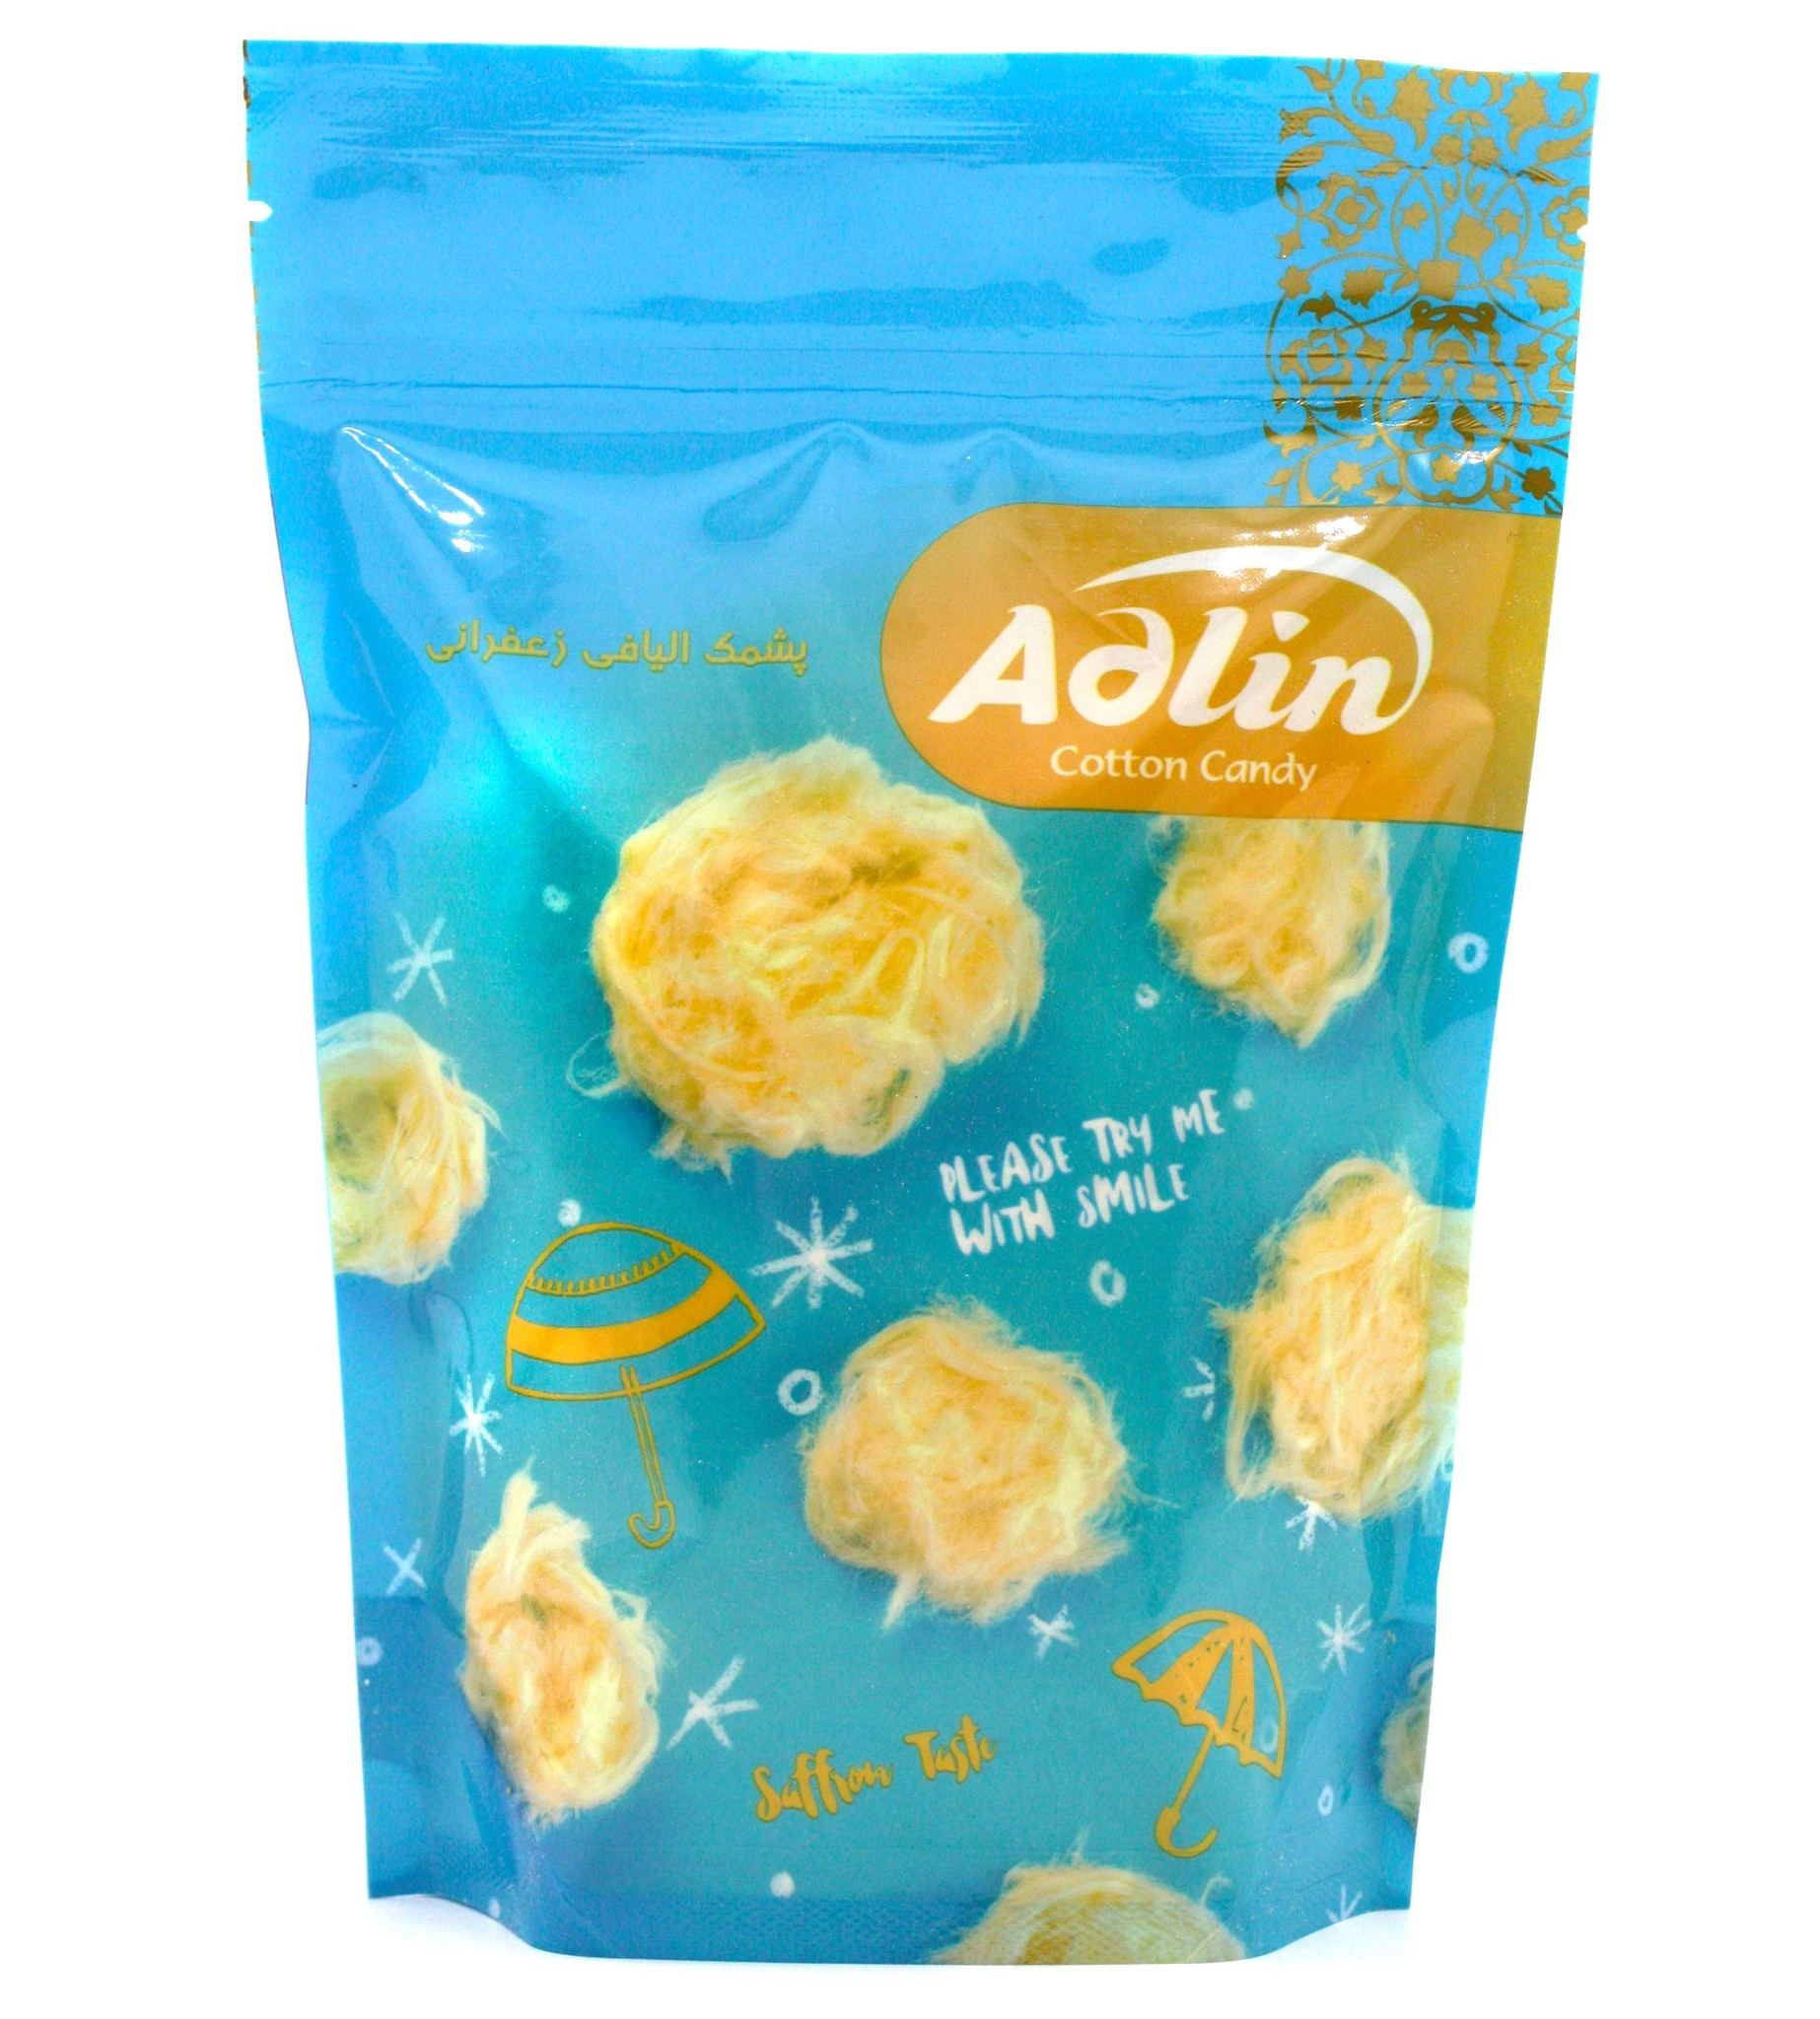 Пишмание Пишмание со вкусом шафрана, Adlin, 150 г import_files_a2_a2b1acc0f24f11e8a9a1484d7ecee297_0dfb2033f79511e8a9a1484d7ecee297.jpg